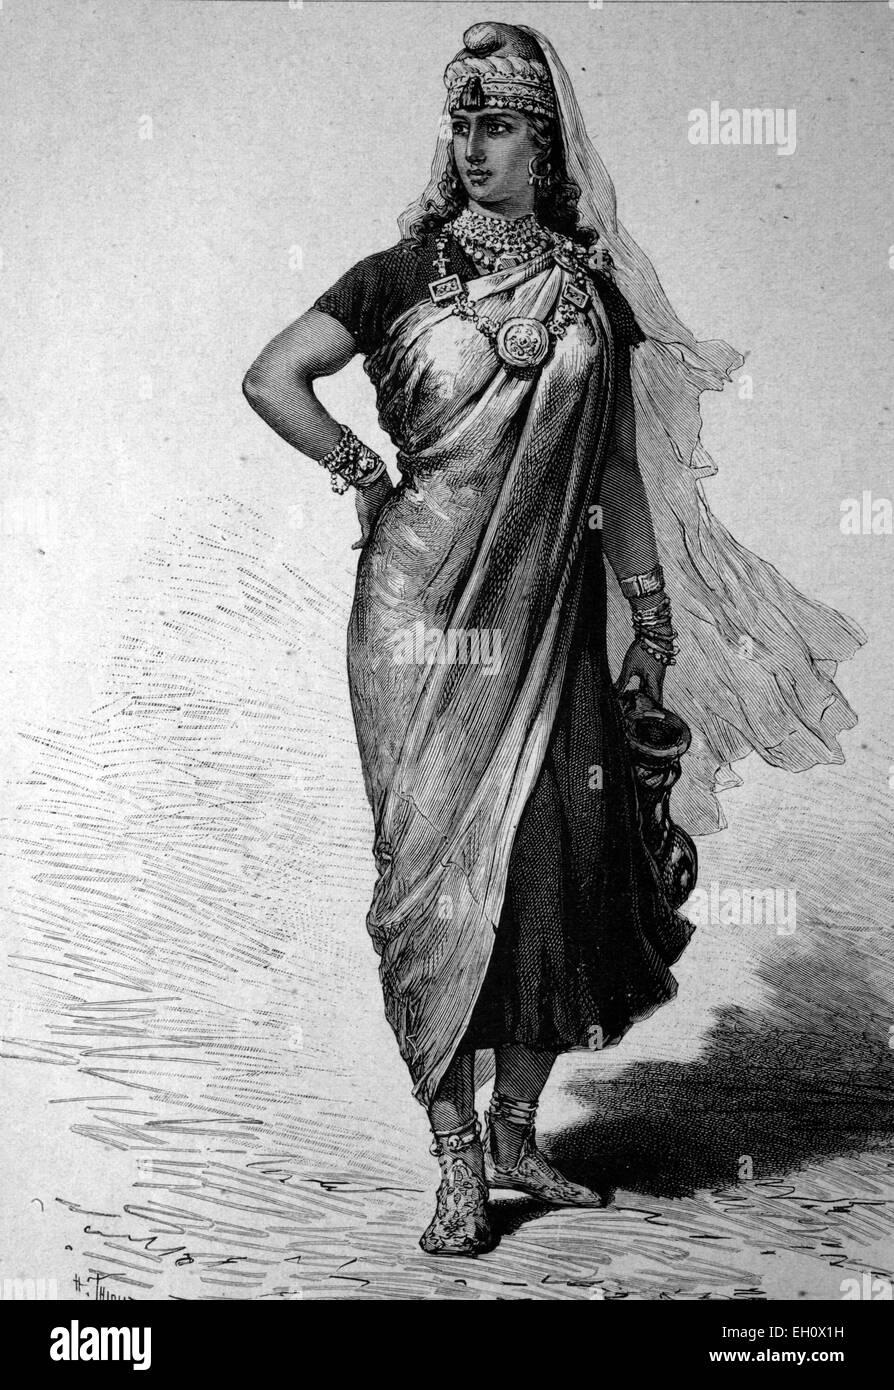 Woman from Ghadames, Libya, historical illustration, circa 1886 - Stock Image